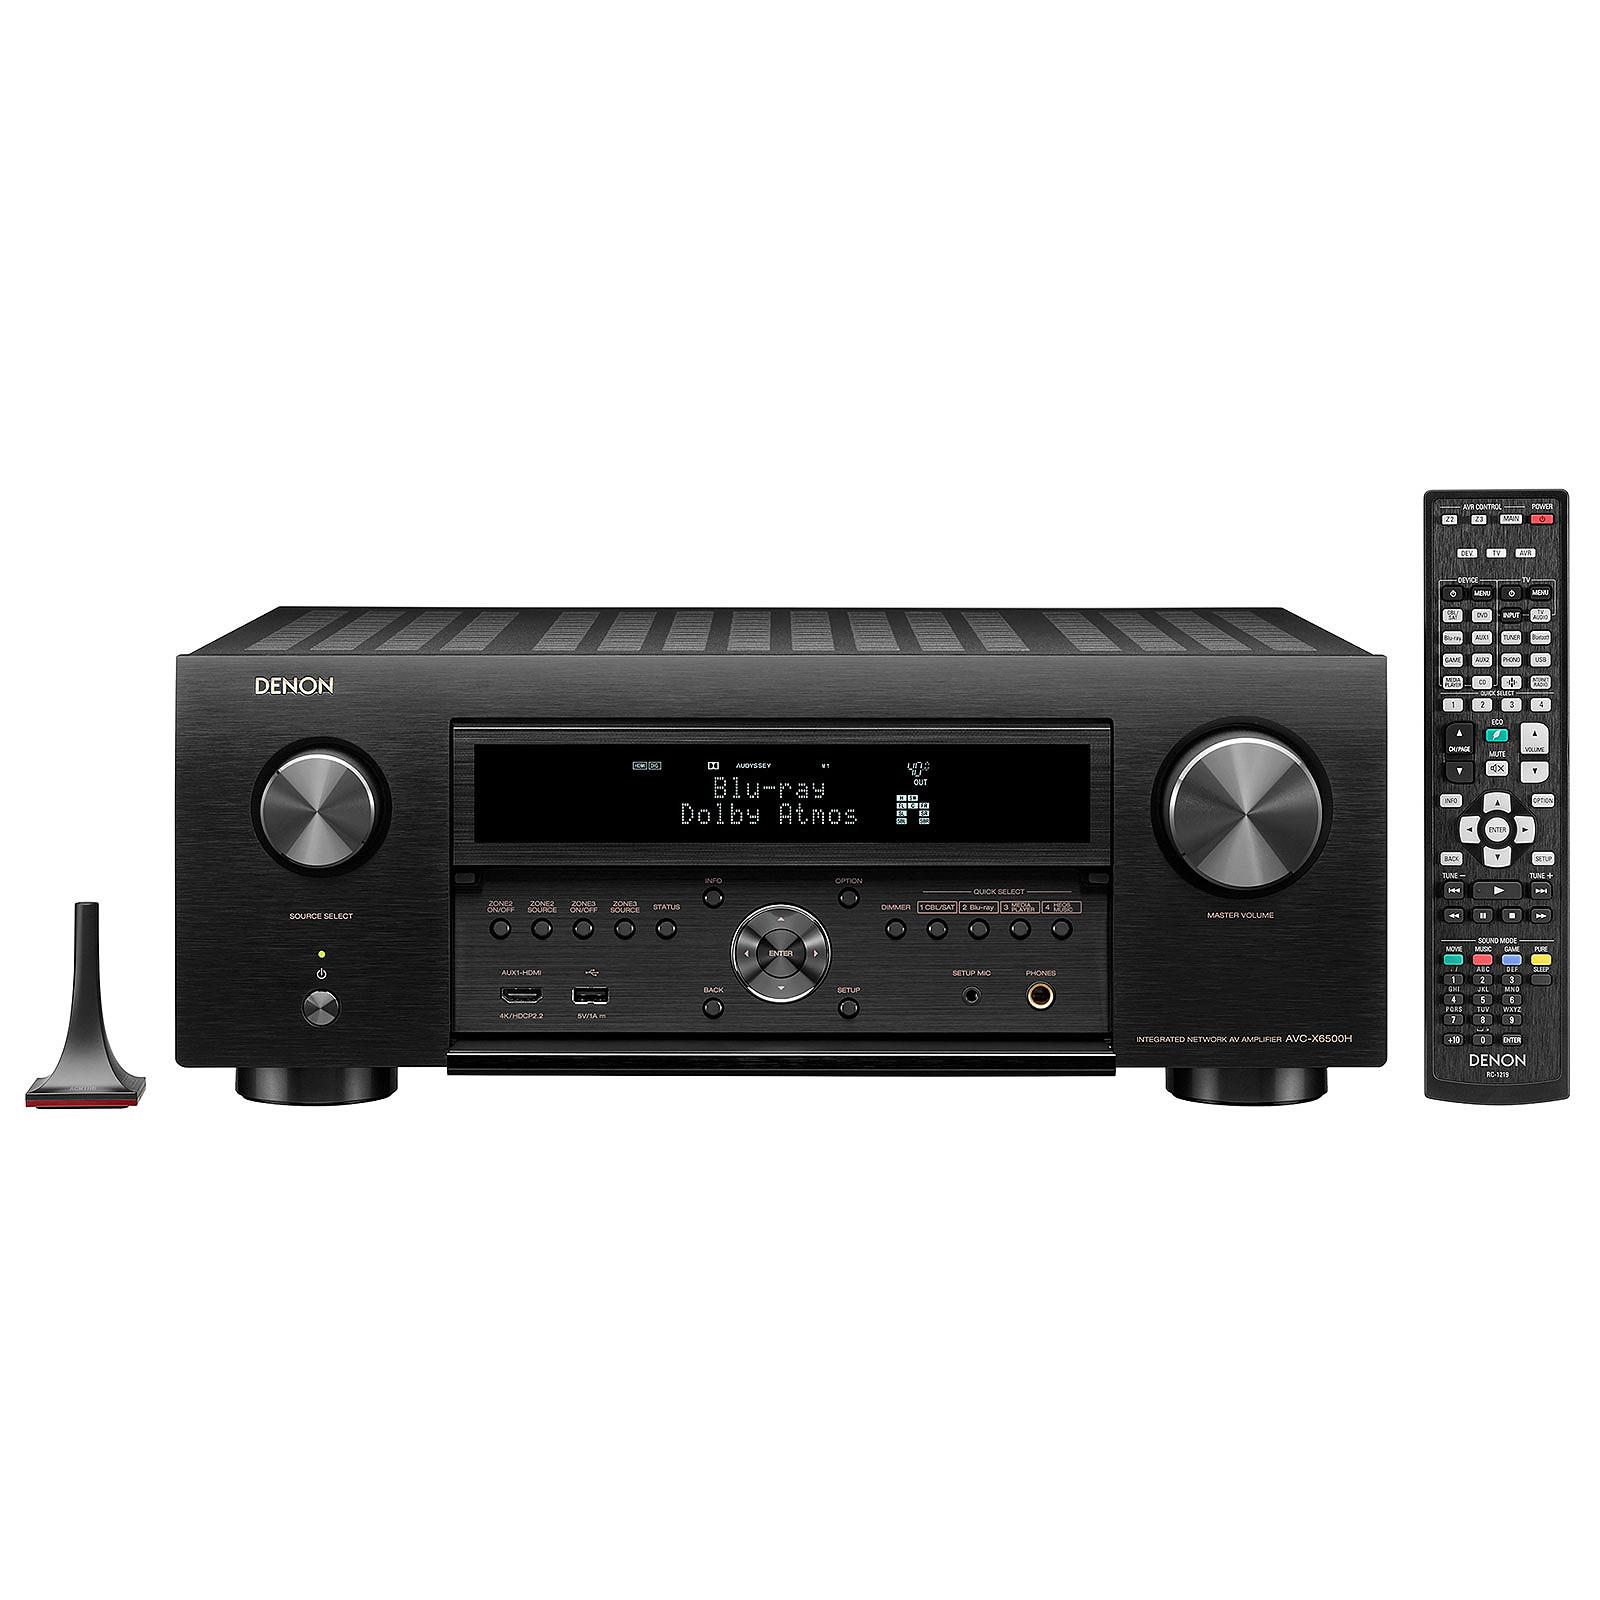 Denon AVC-X6500H Noir